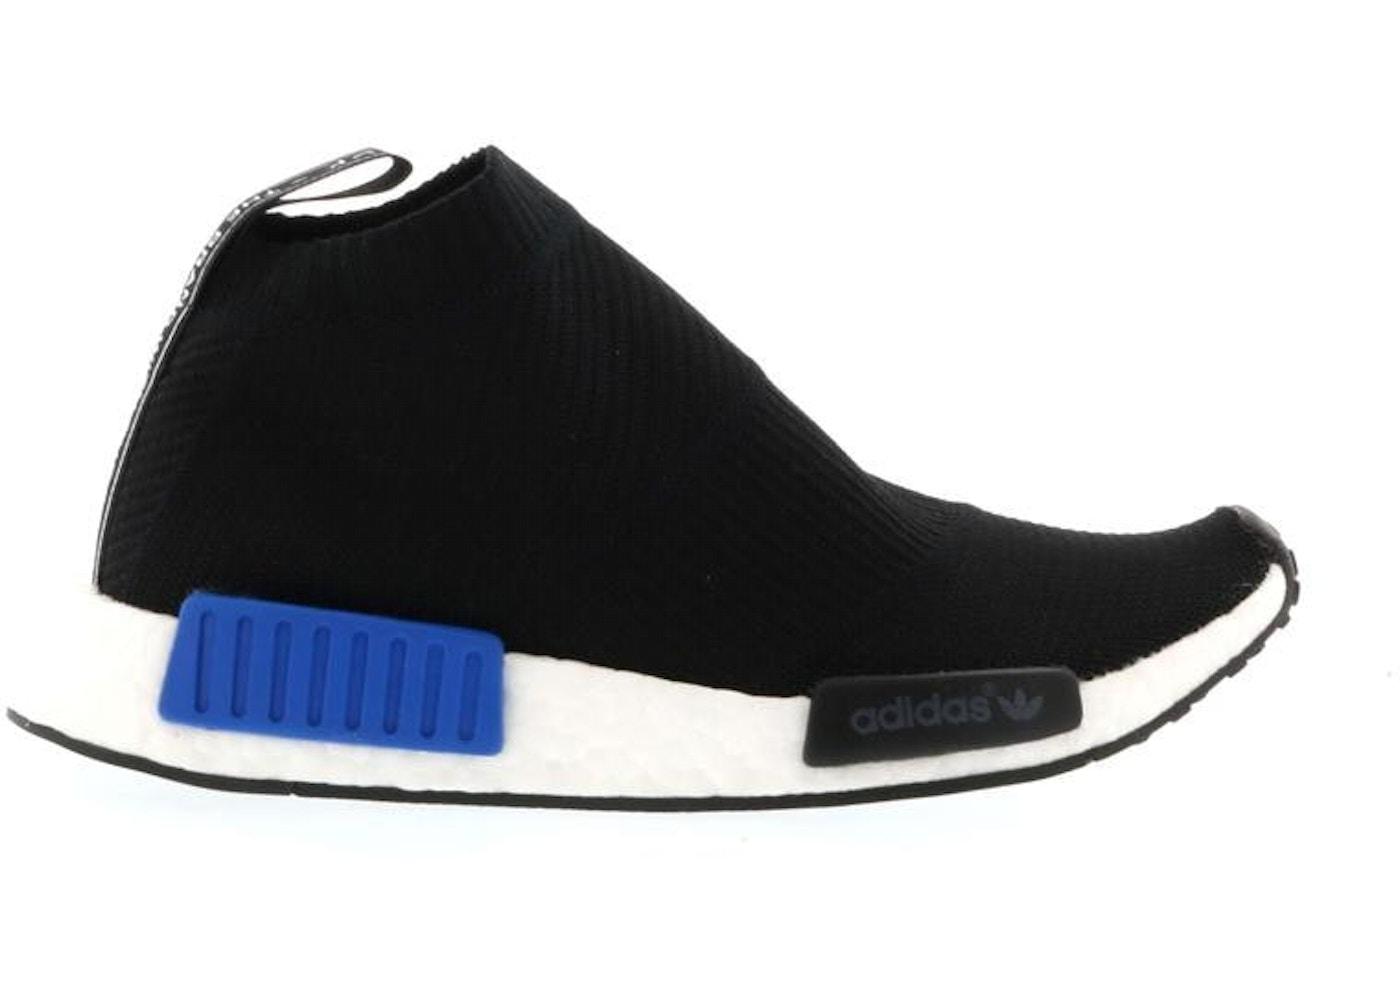 veredicto polilla Haiku  adidas NMD City Sock Core Black Lush Blue - S79152